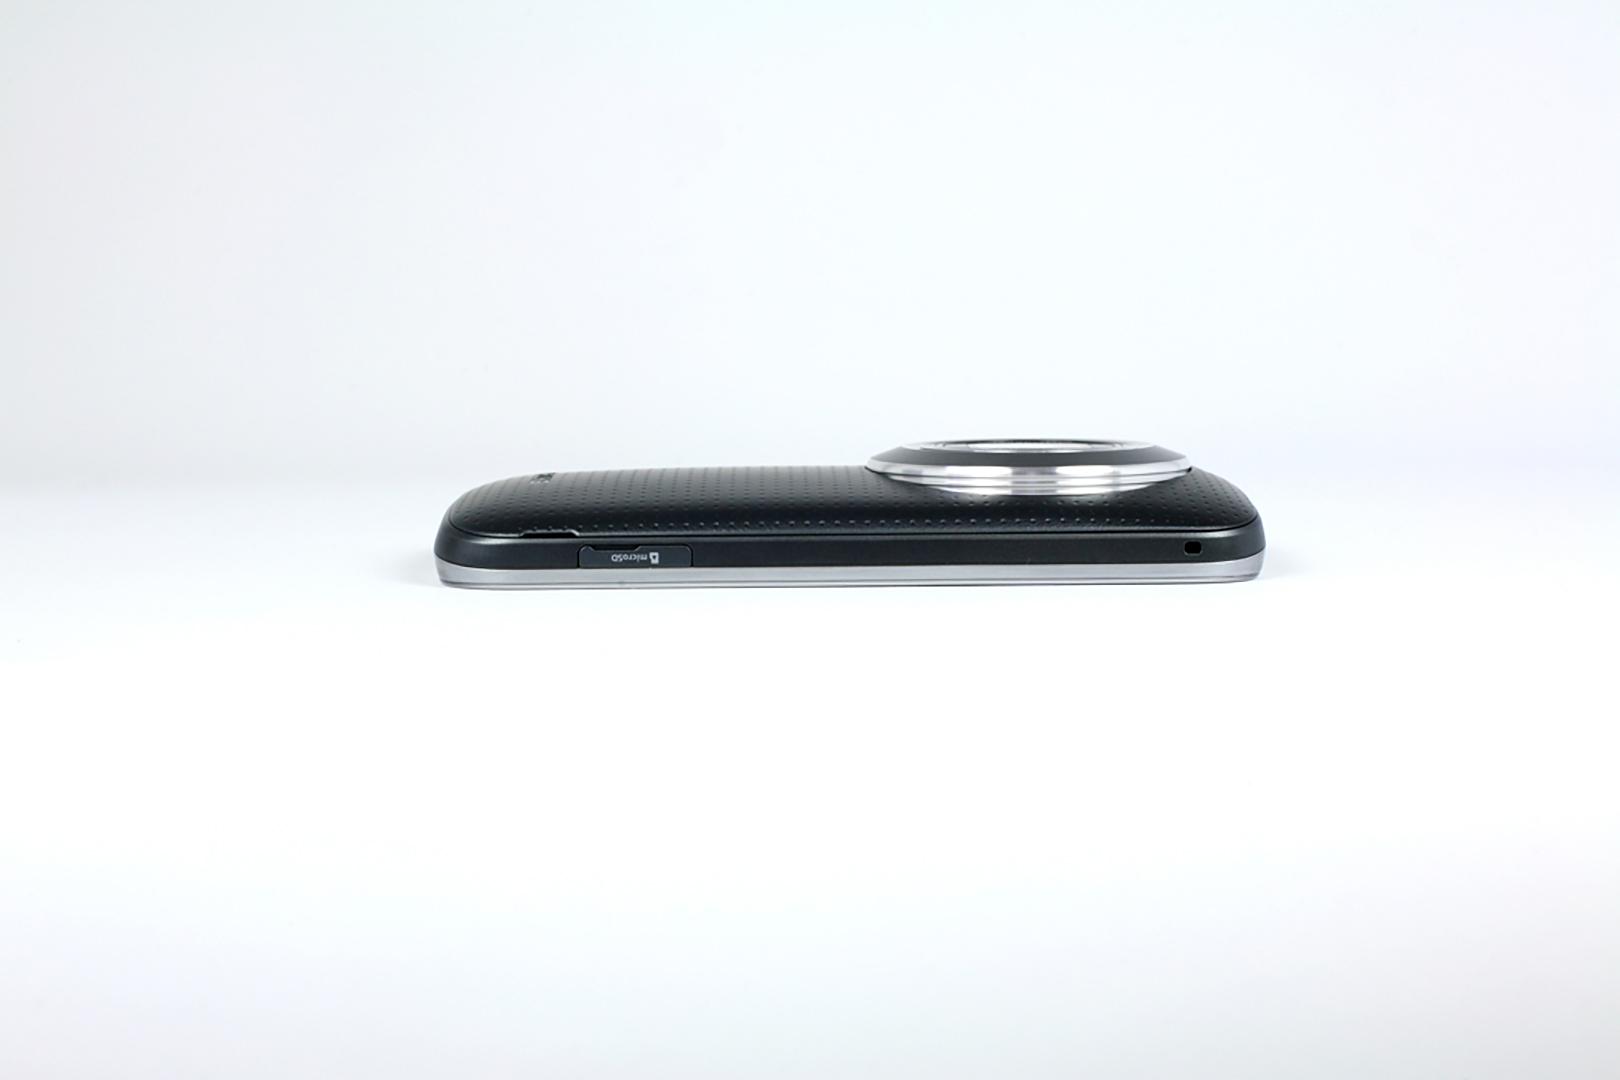 Kszlkbellts Samsung Galaxy K Zoom 8gb Black